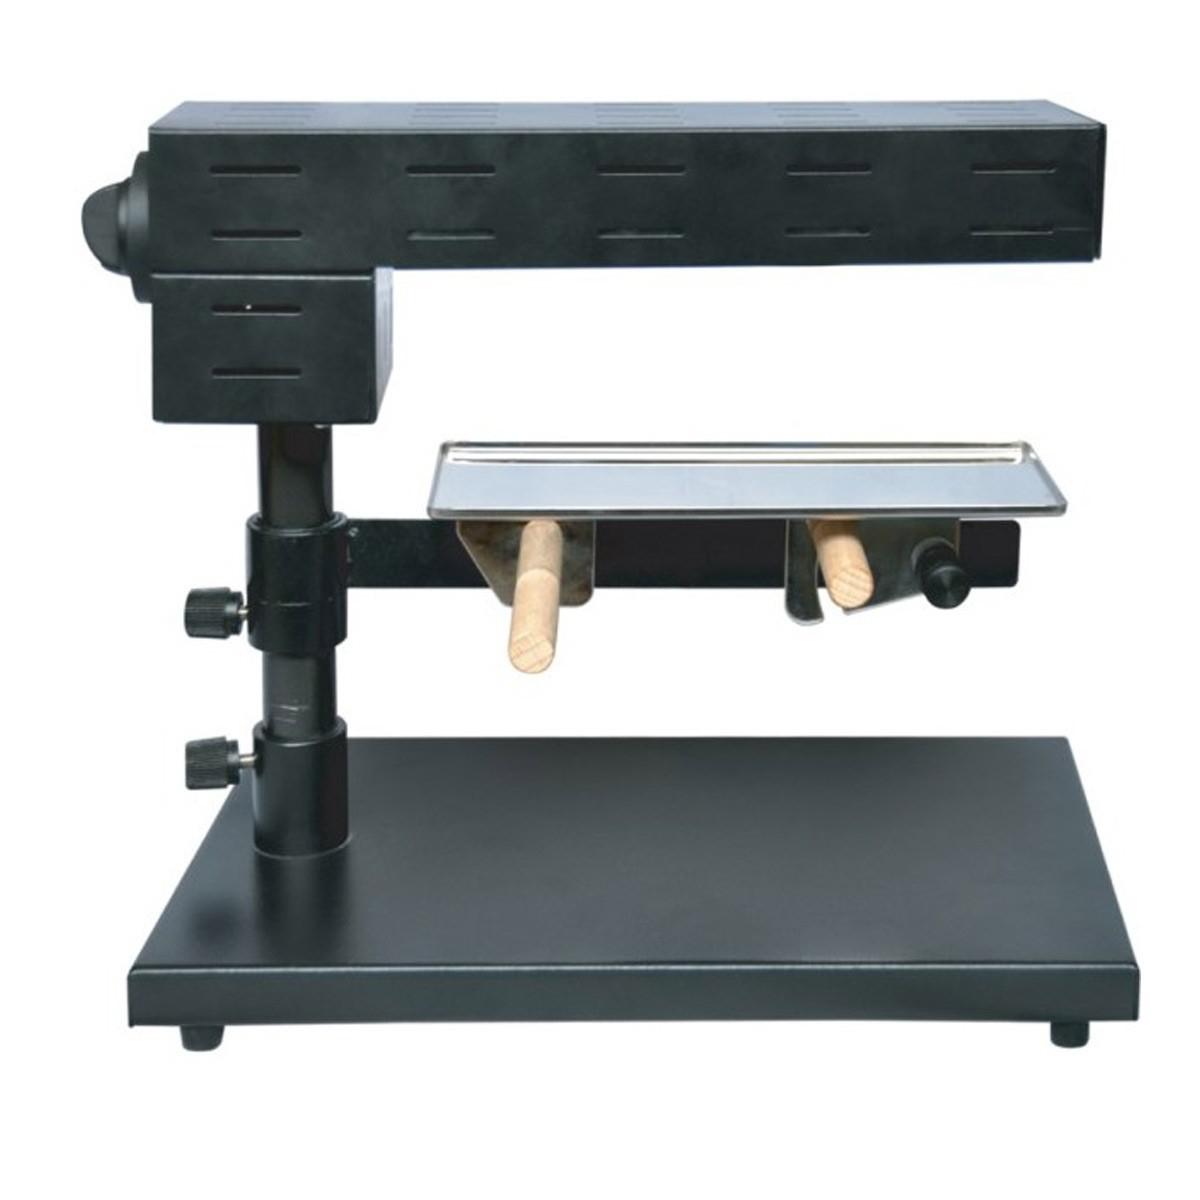 Machine à Raclette Traditonelle - Harper HRT601V